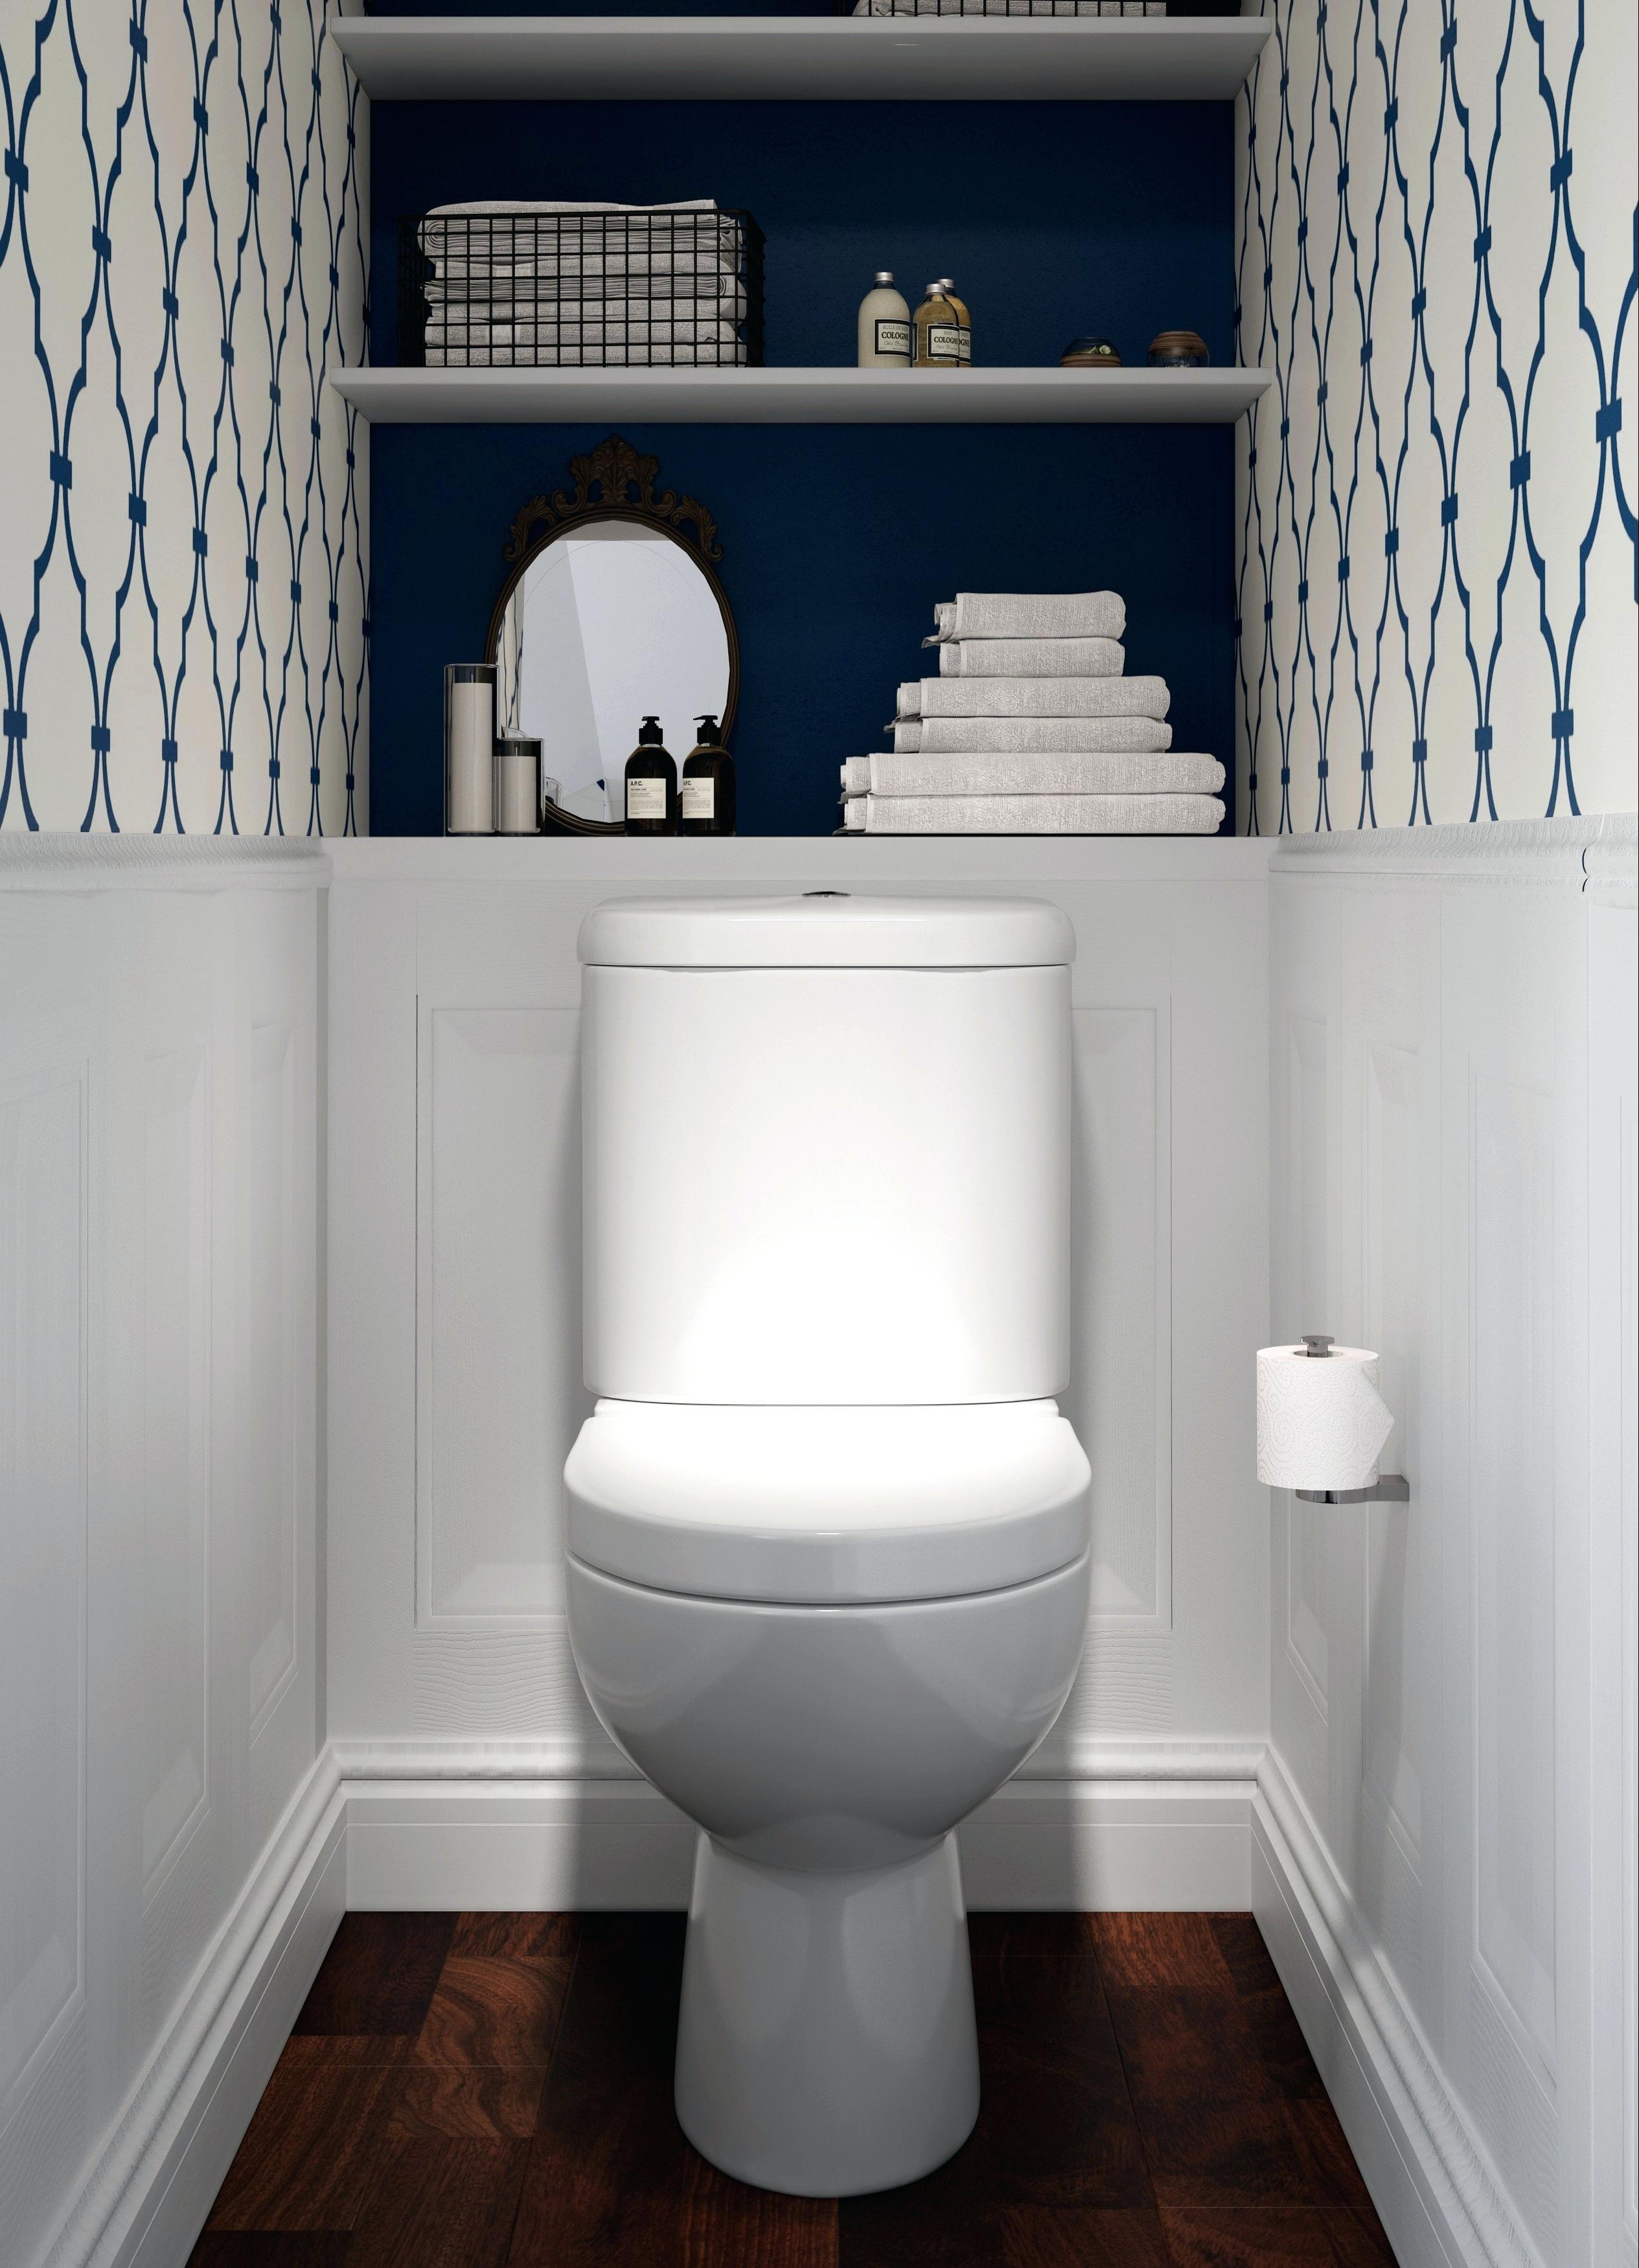 14 Beautiful And Small Cloakroom Bathroom Ideas Design Toilet